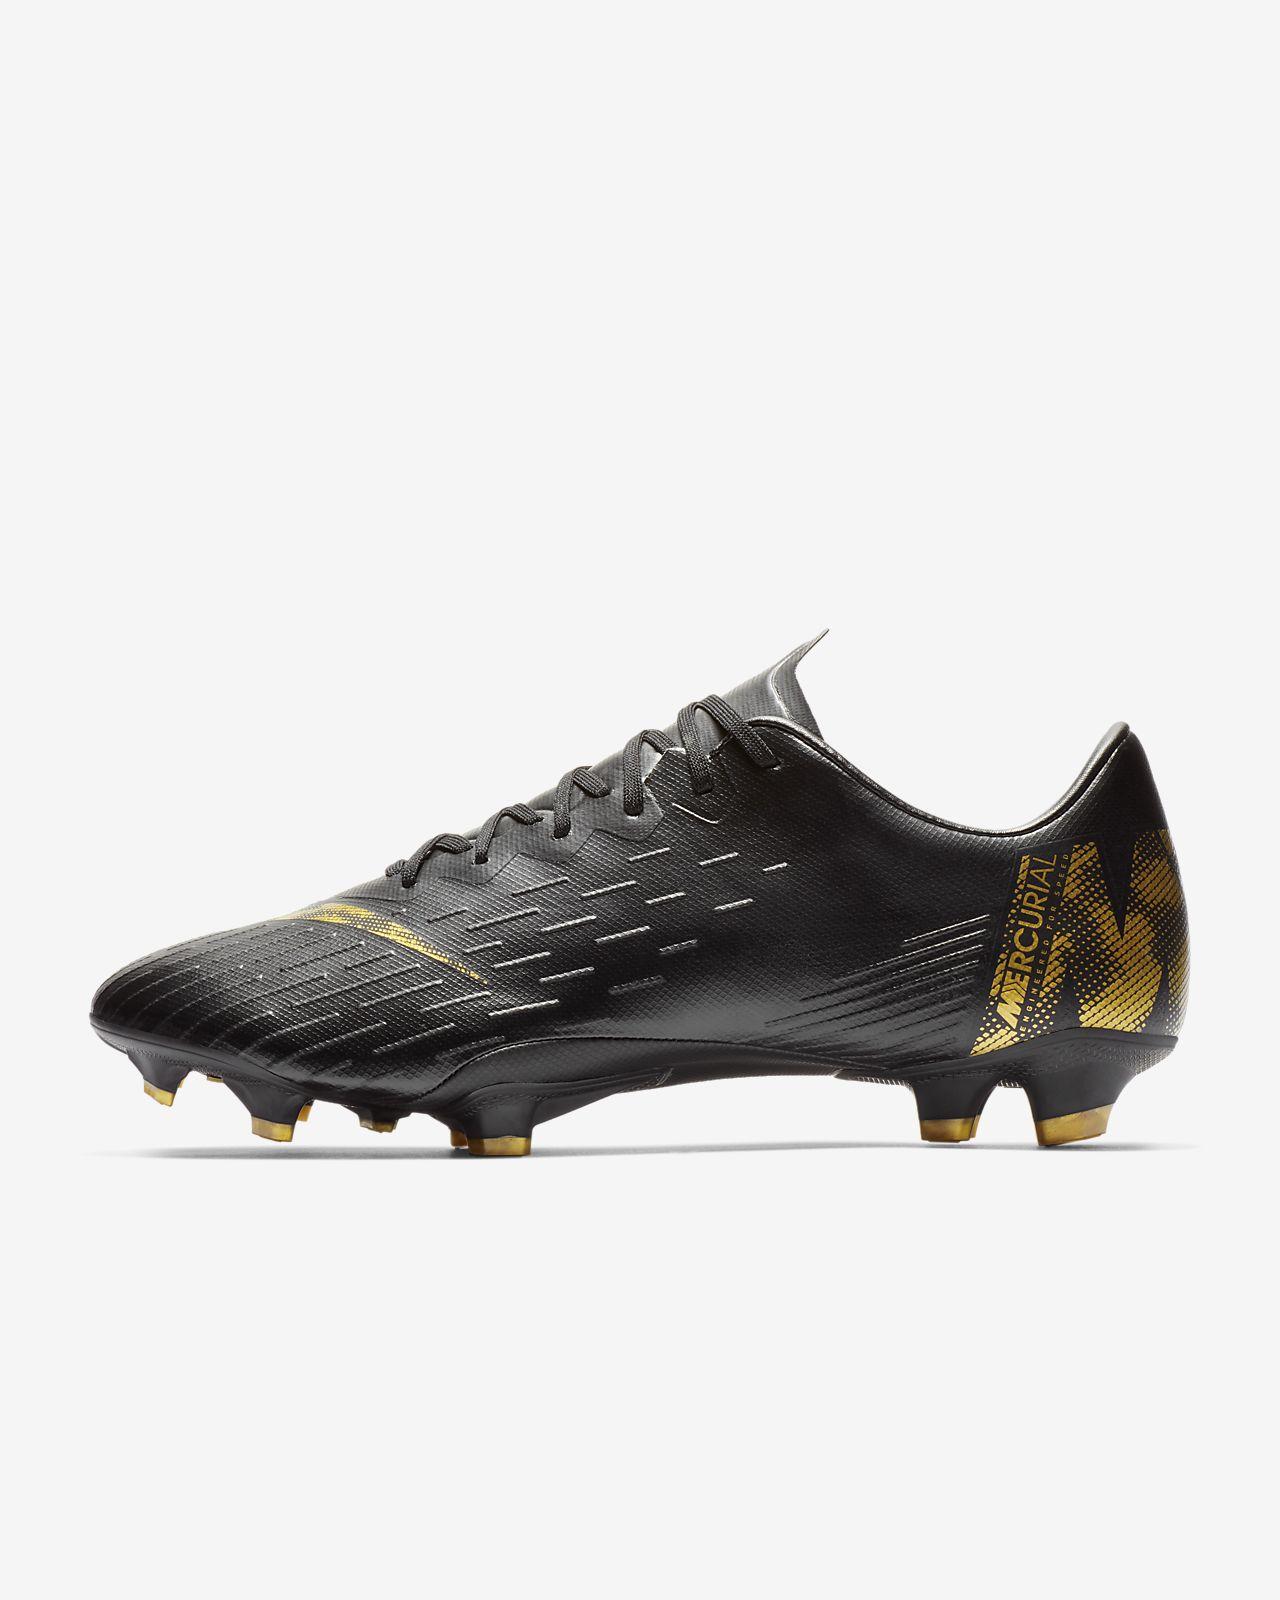 a22c8cf30d1ed Nike Vapor 12 Pro FG Botas de fútbol para terreno firme. Nike.com ES